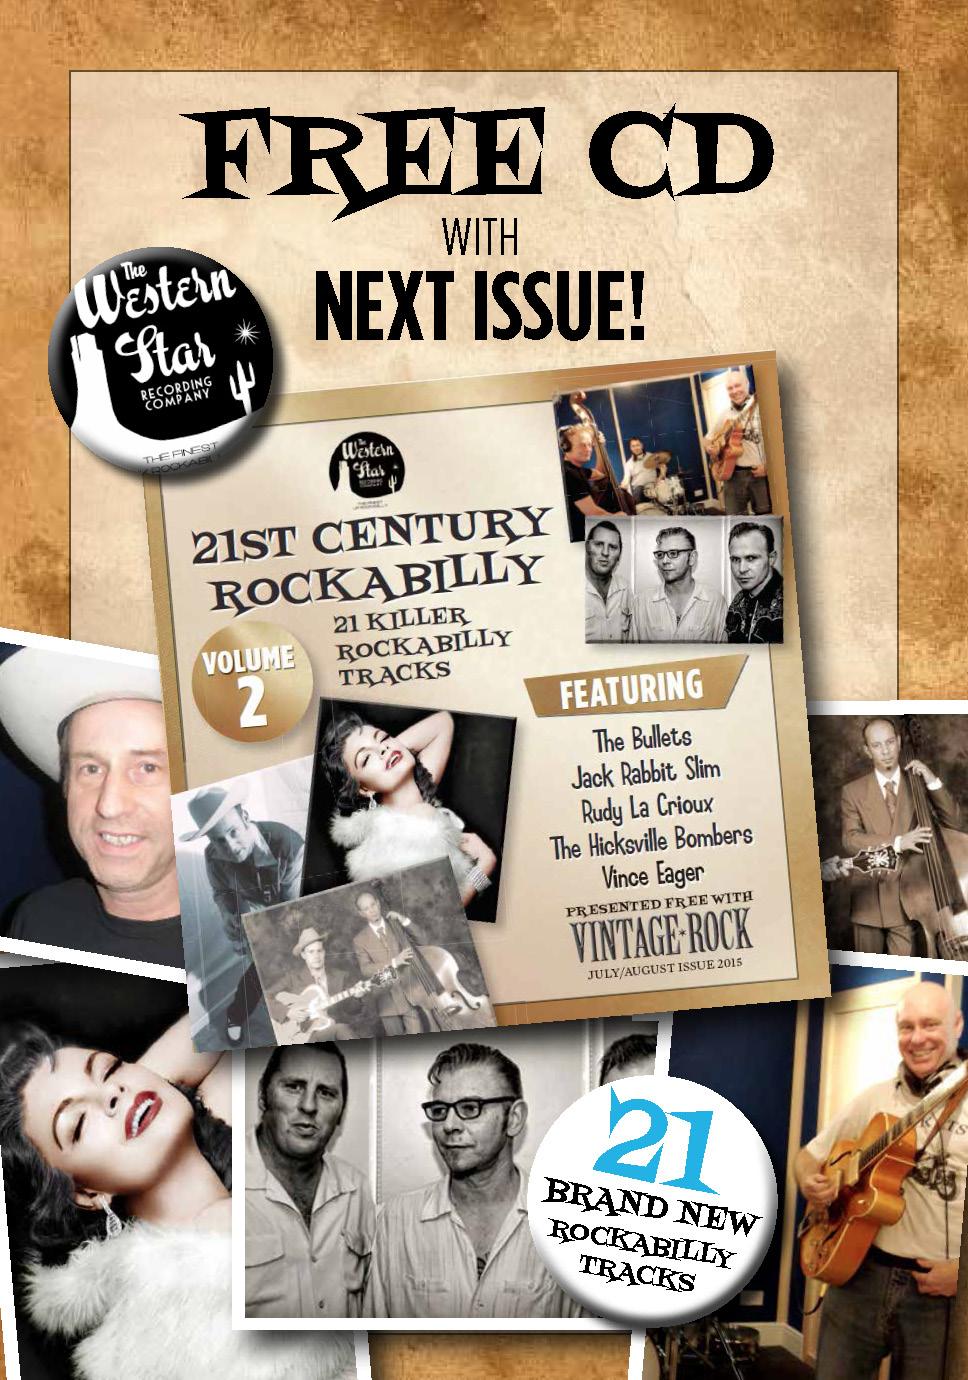 Enjoy a FREE Rockabilly CD with Vintage Rock Issue 18